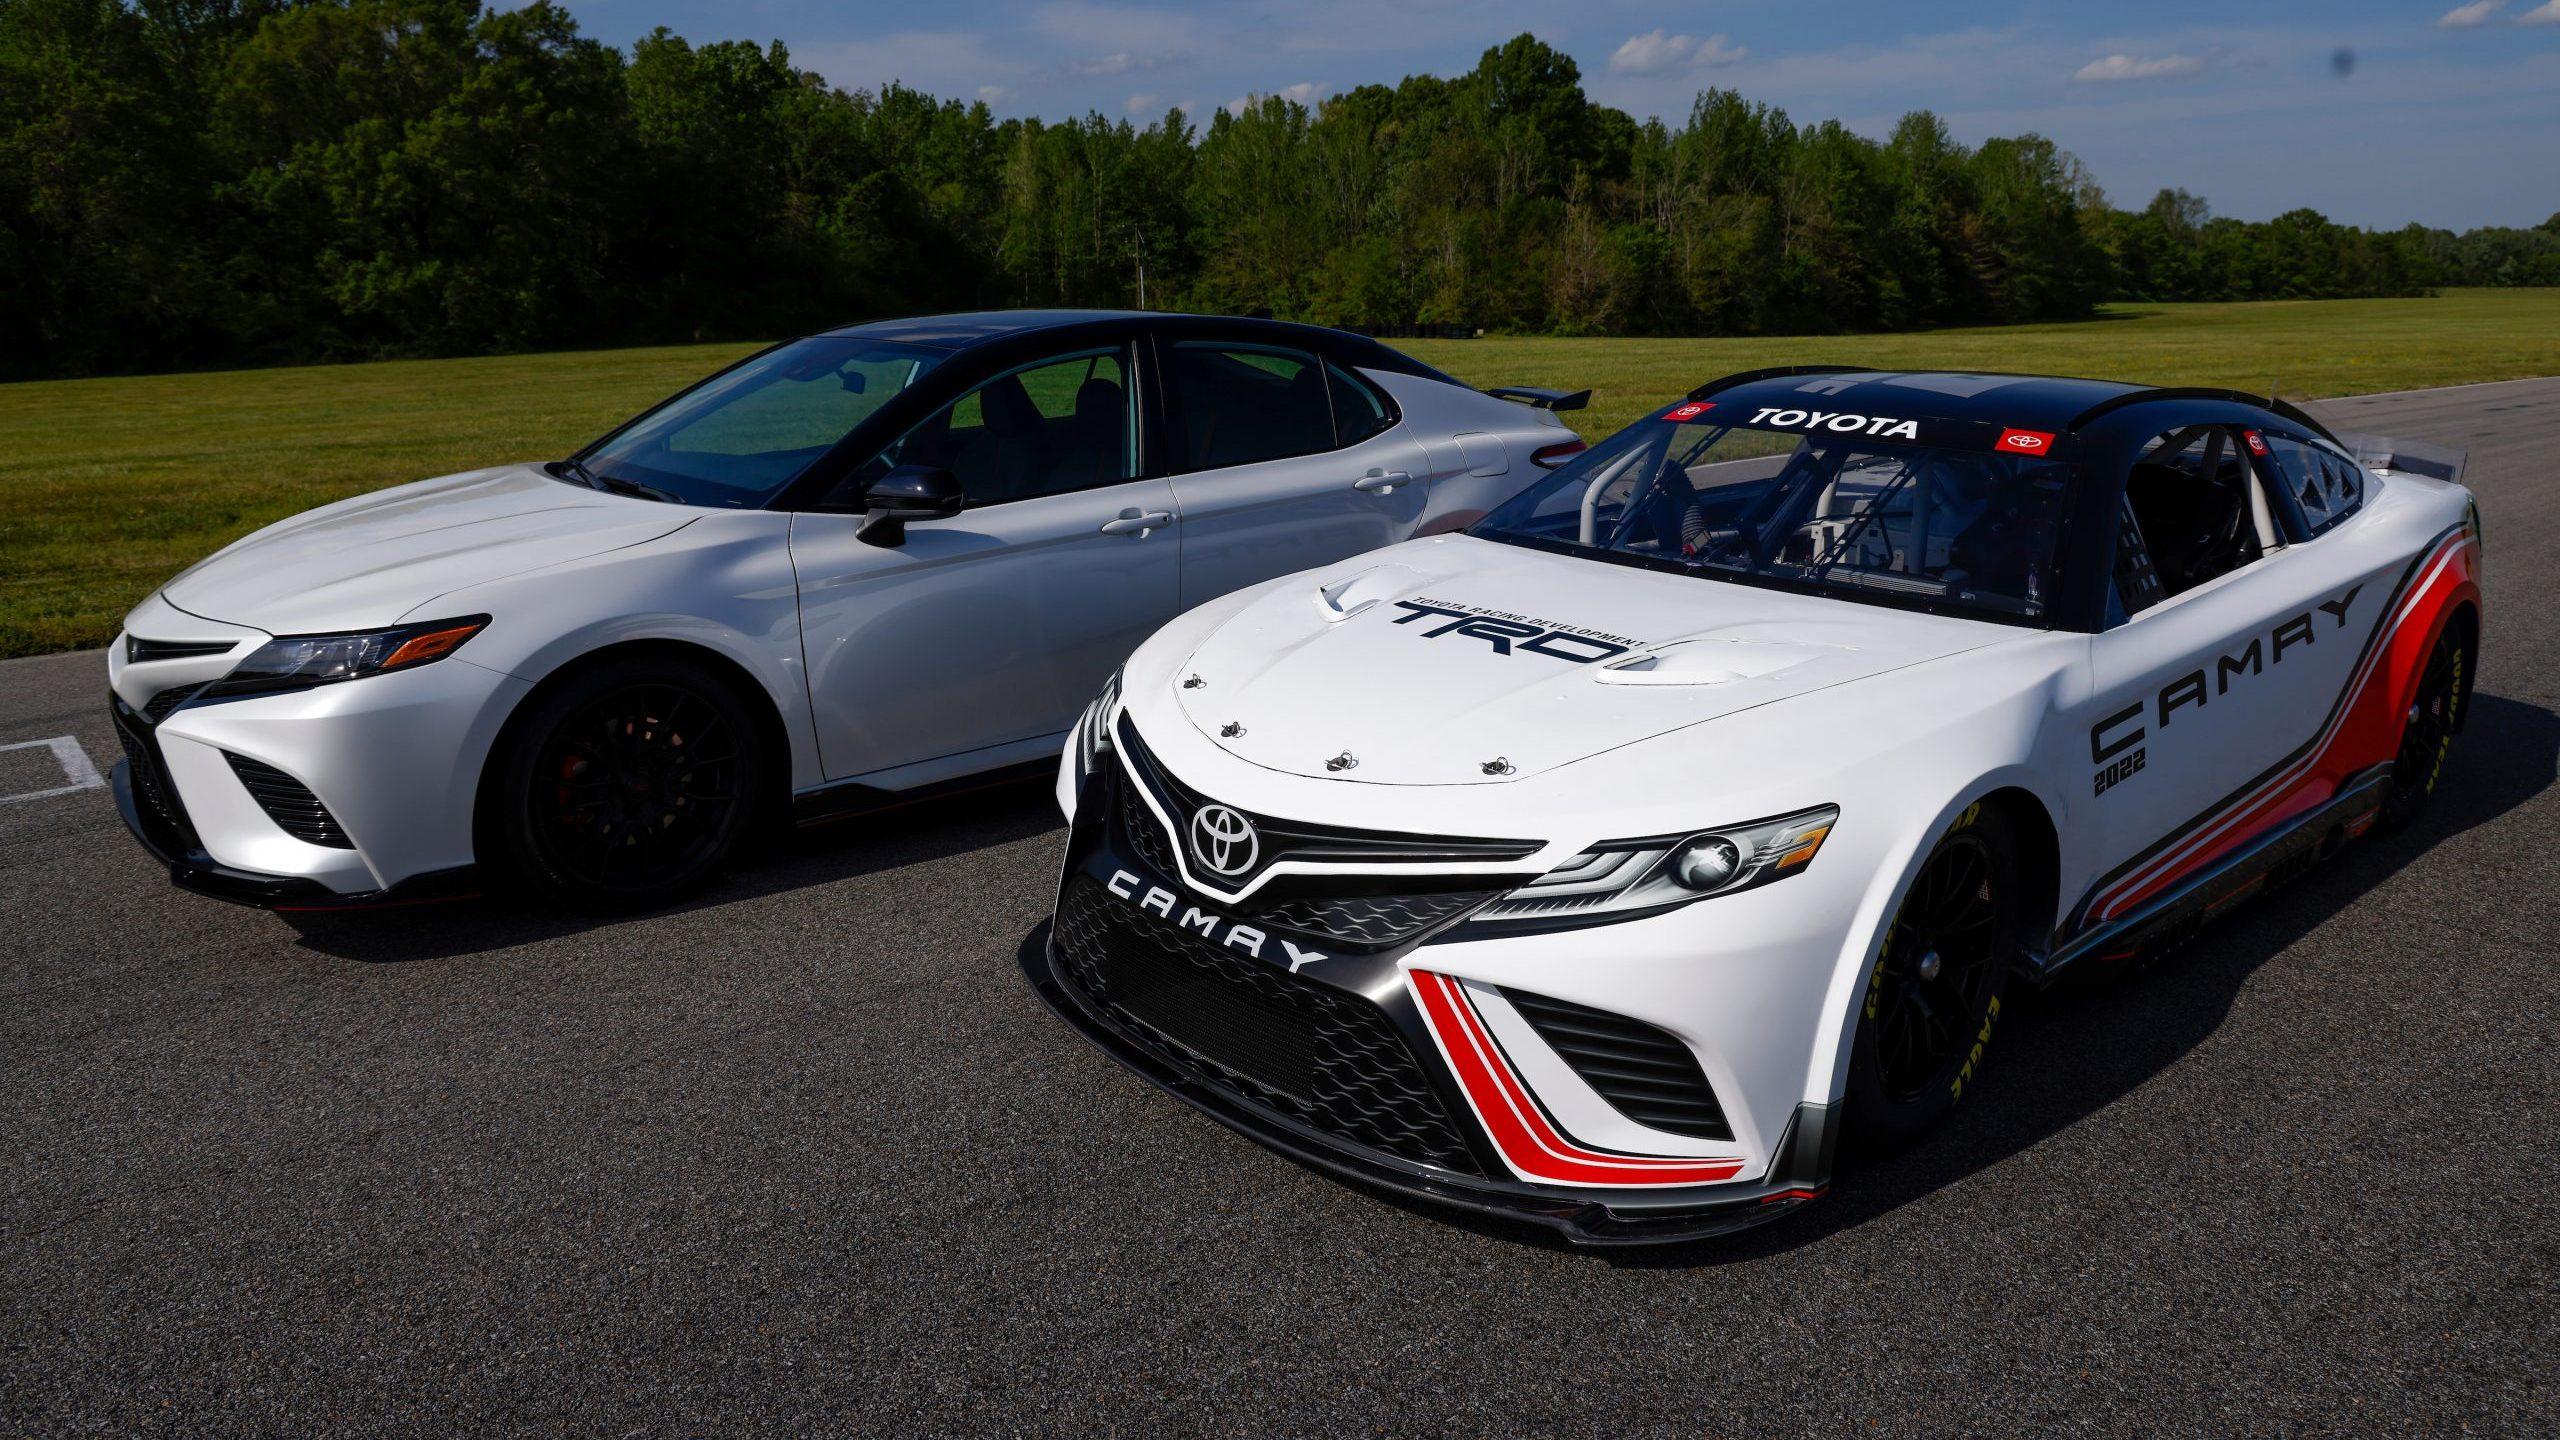 NASCAR Toyota Stock car camry